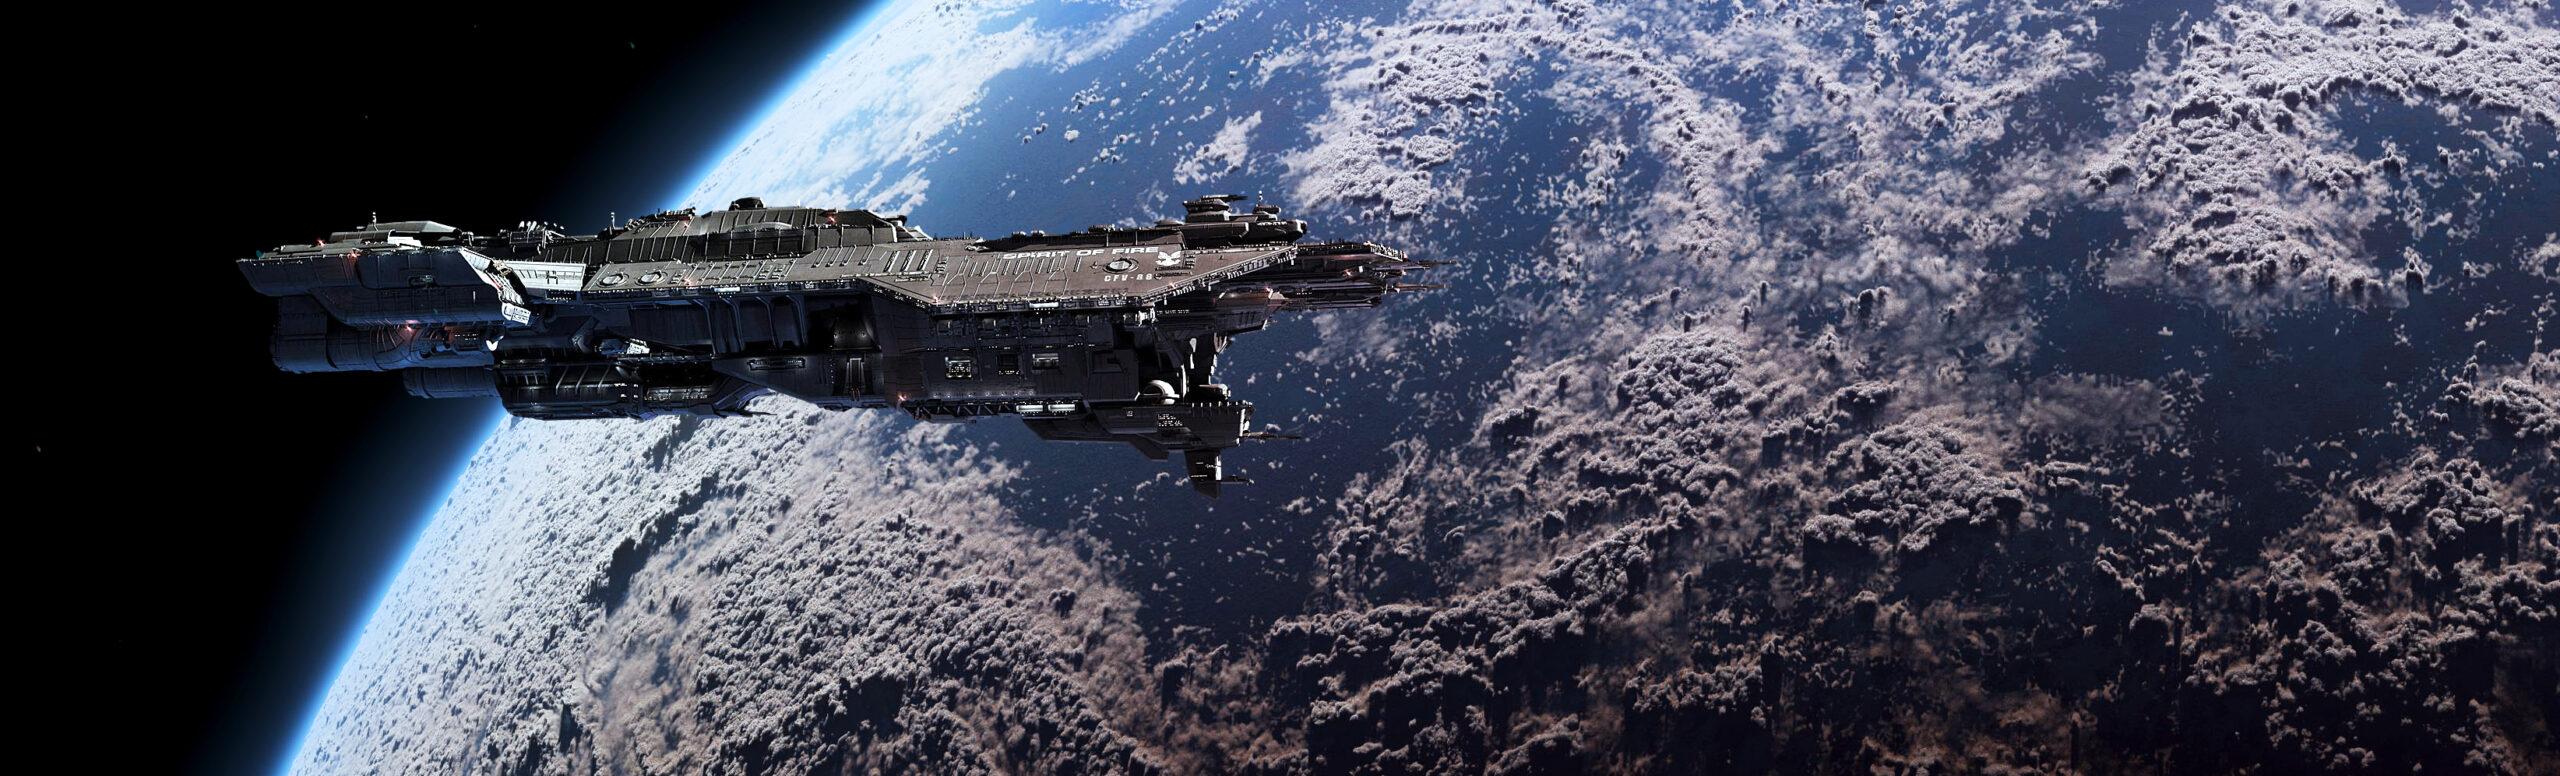 wh40k_planetspace_cgf